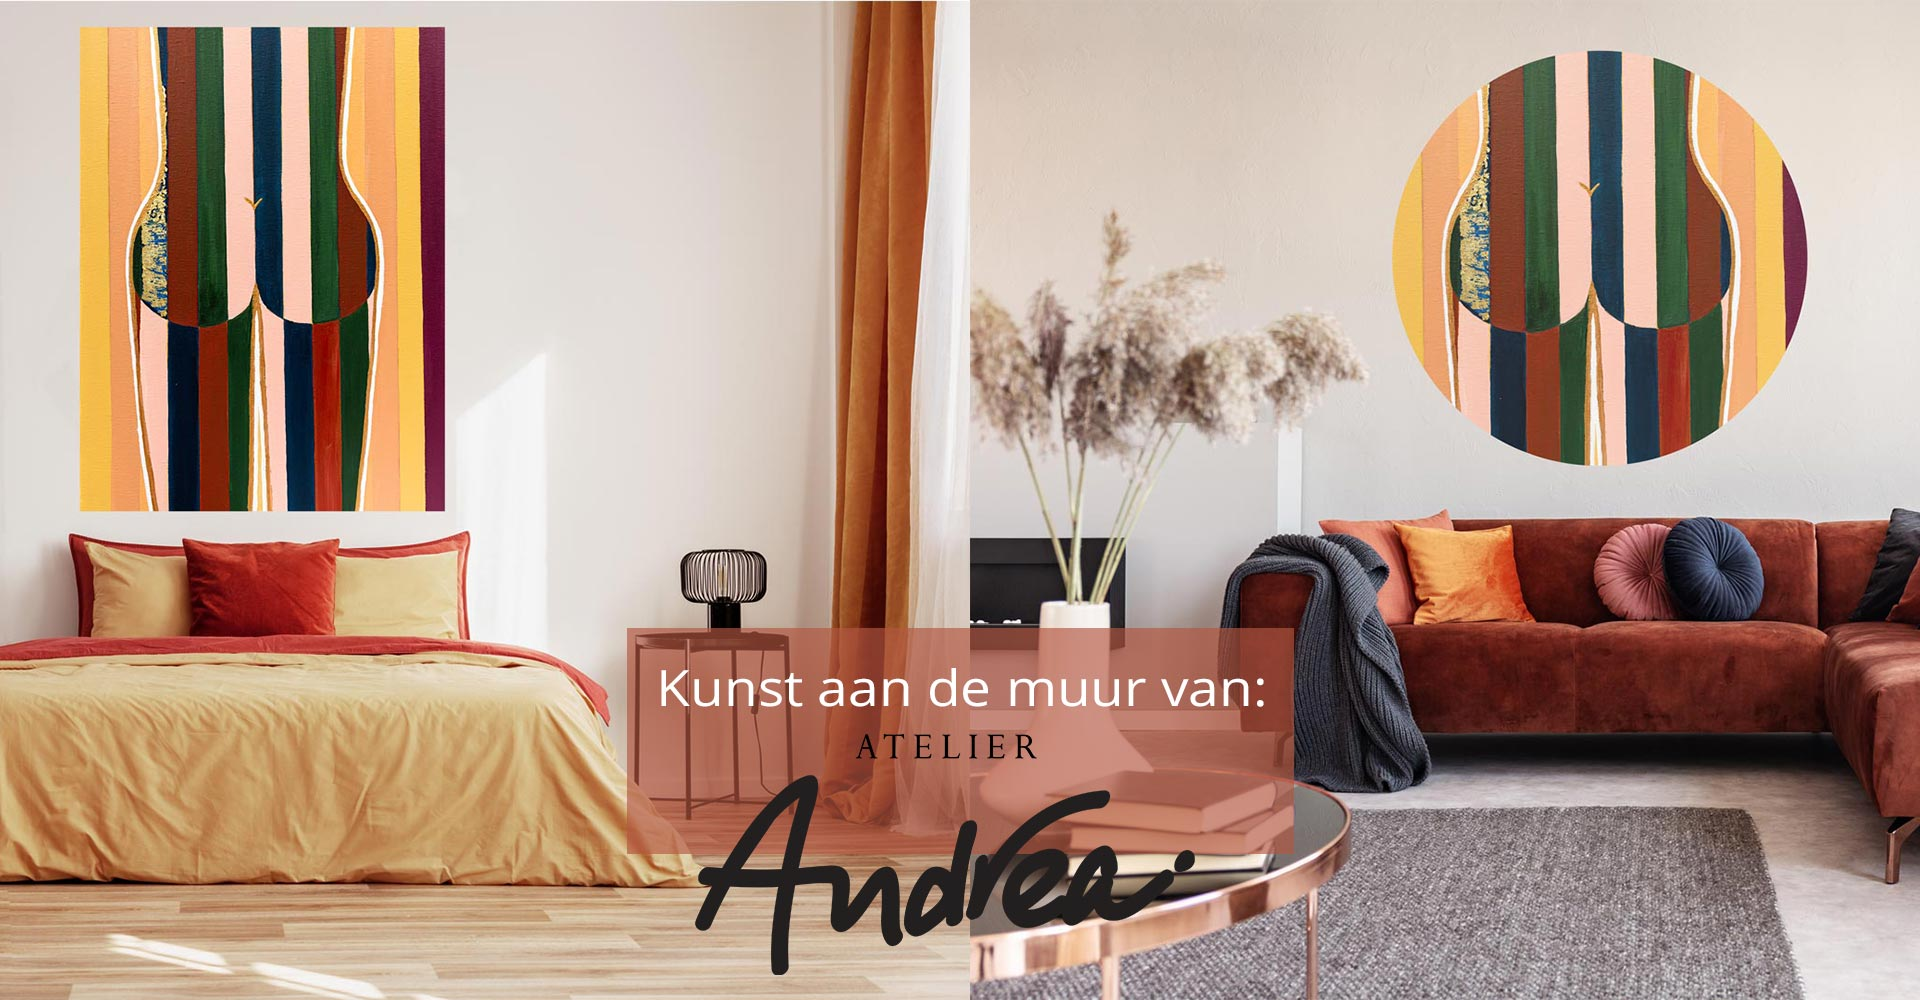 Atelier-Andrea-winter-20-21